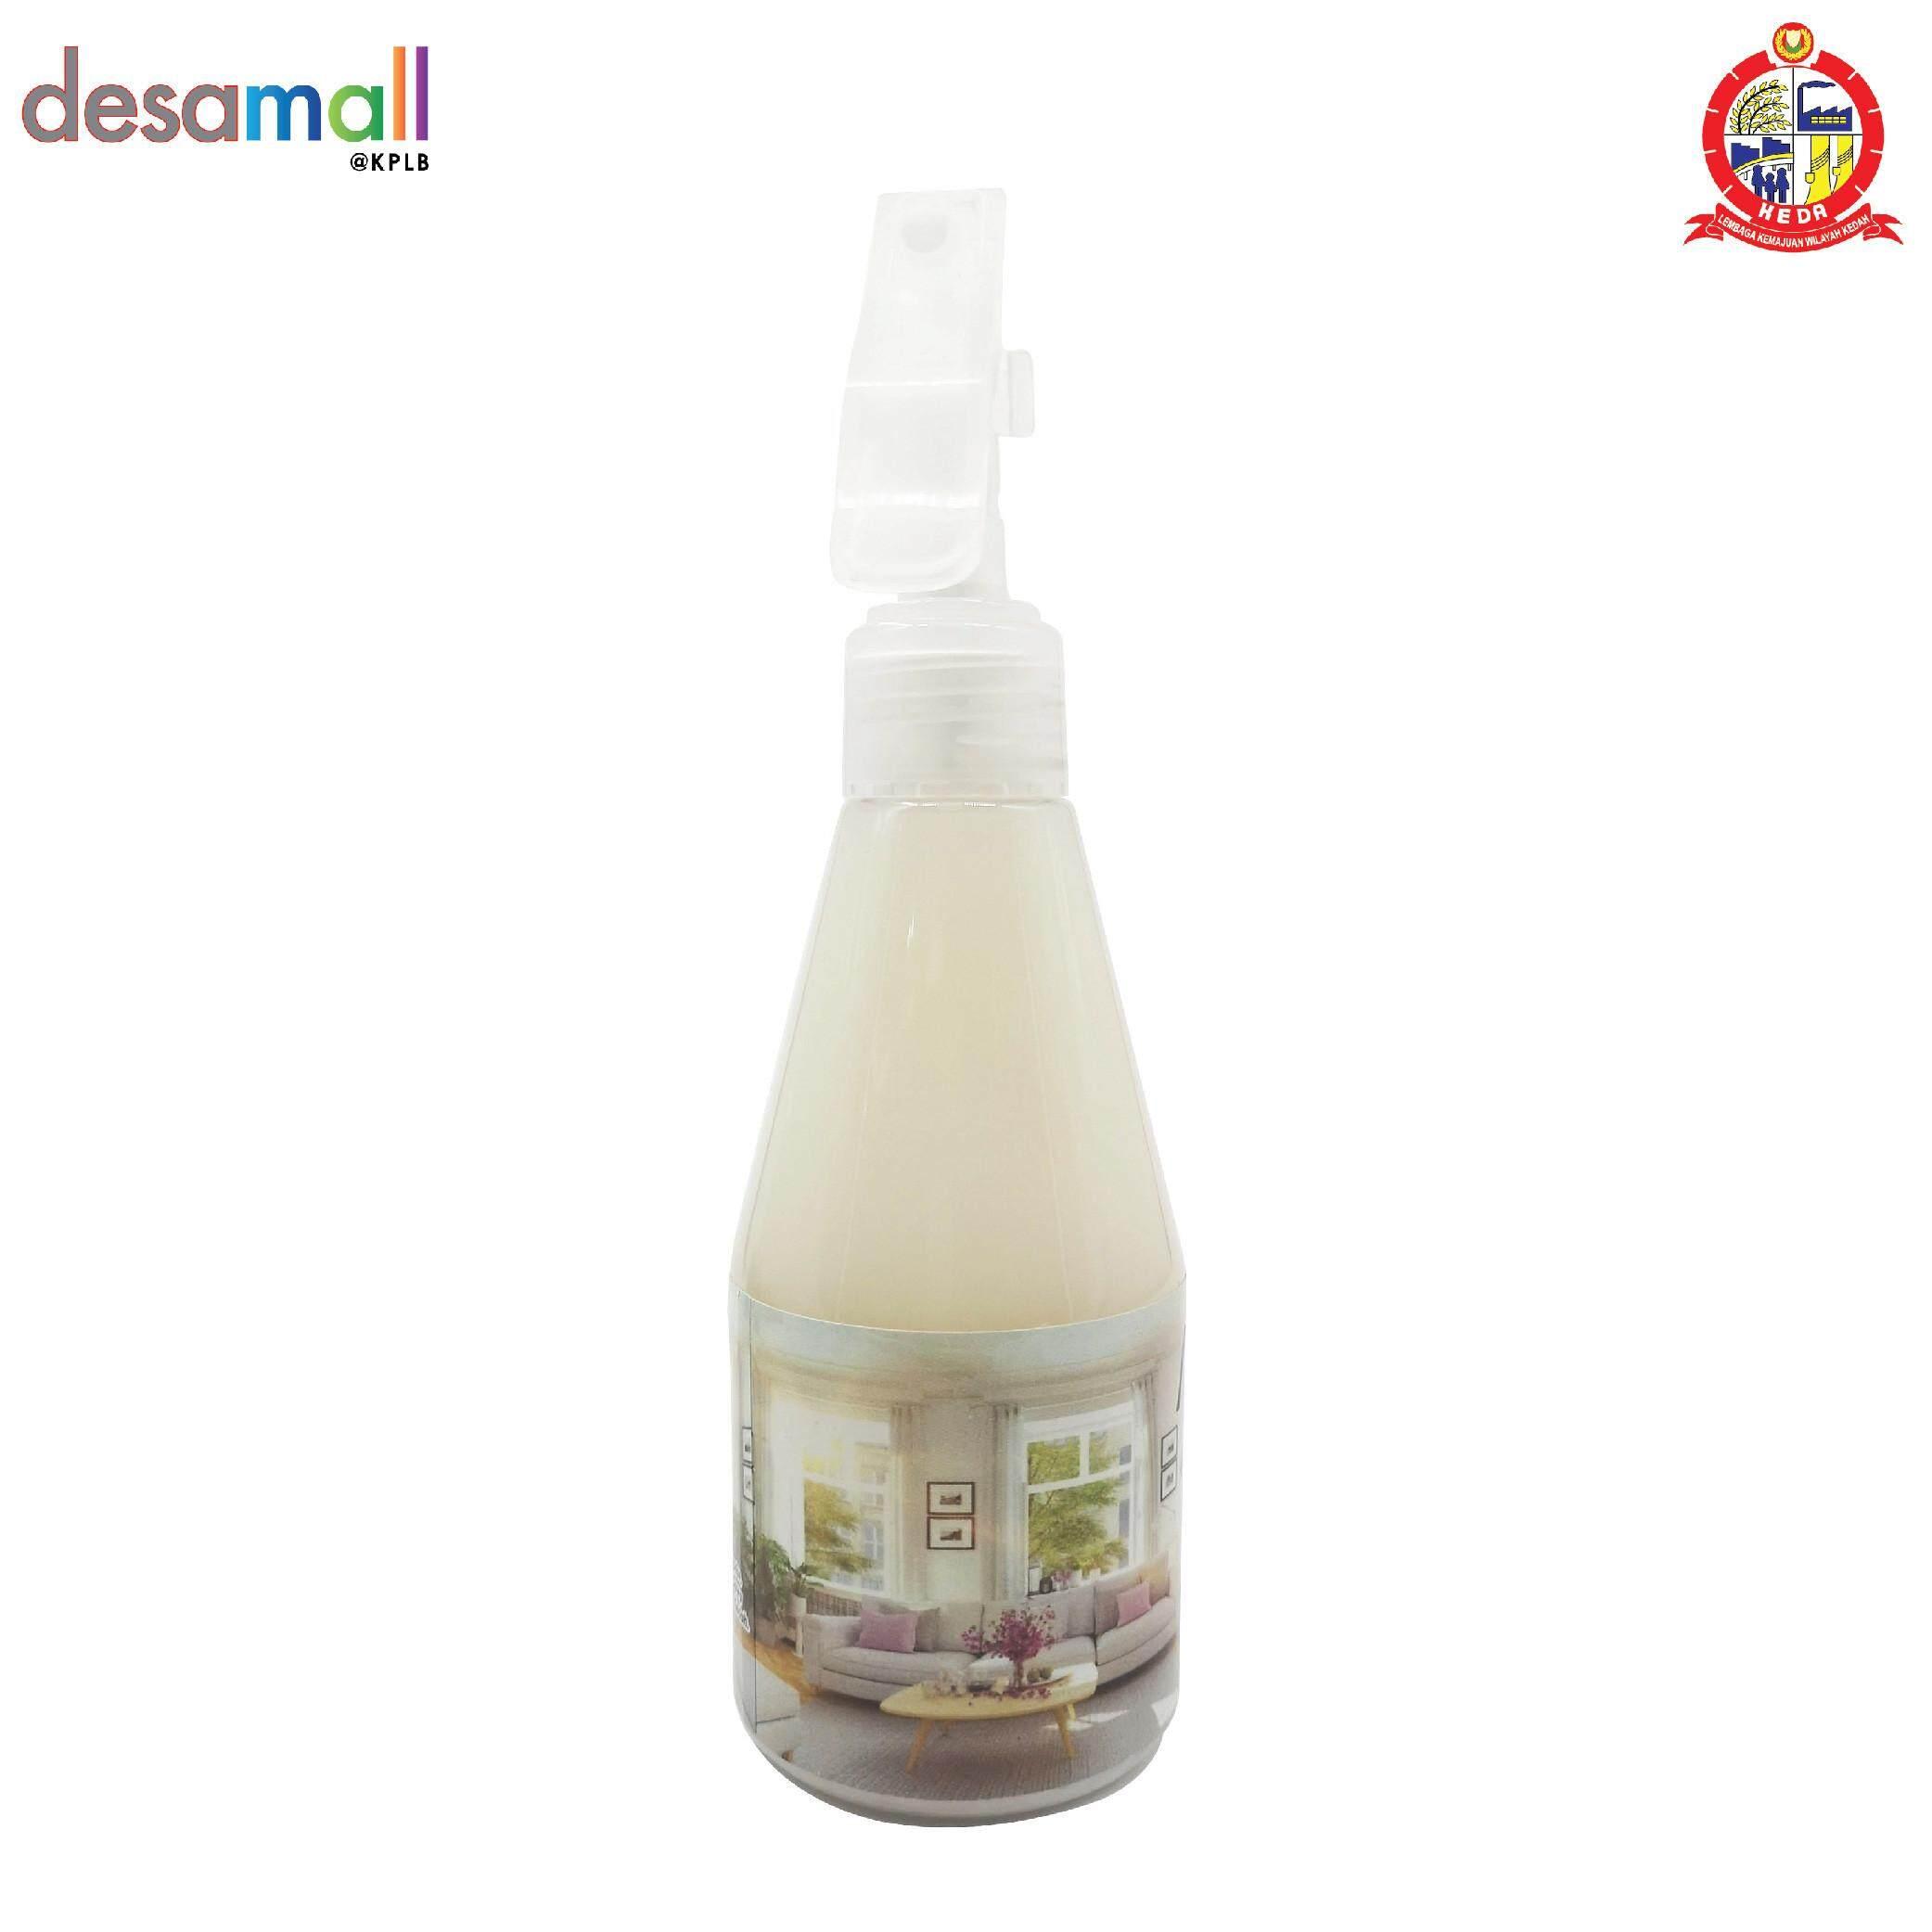 ALQATA Fabric and Air Freshener Spray Zenia (200ml)